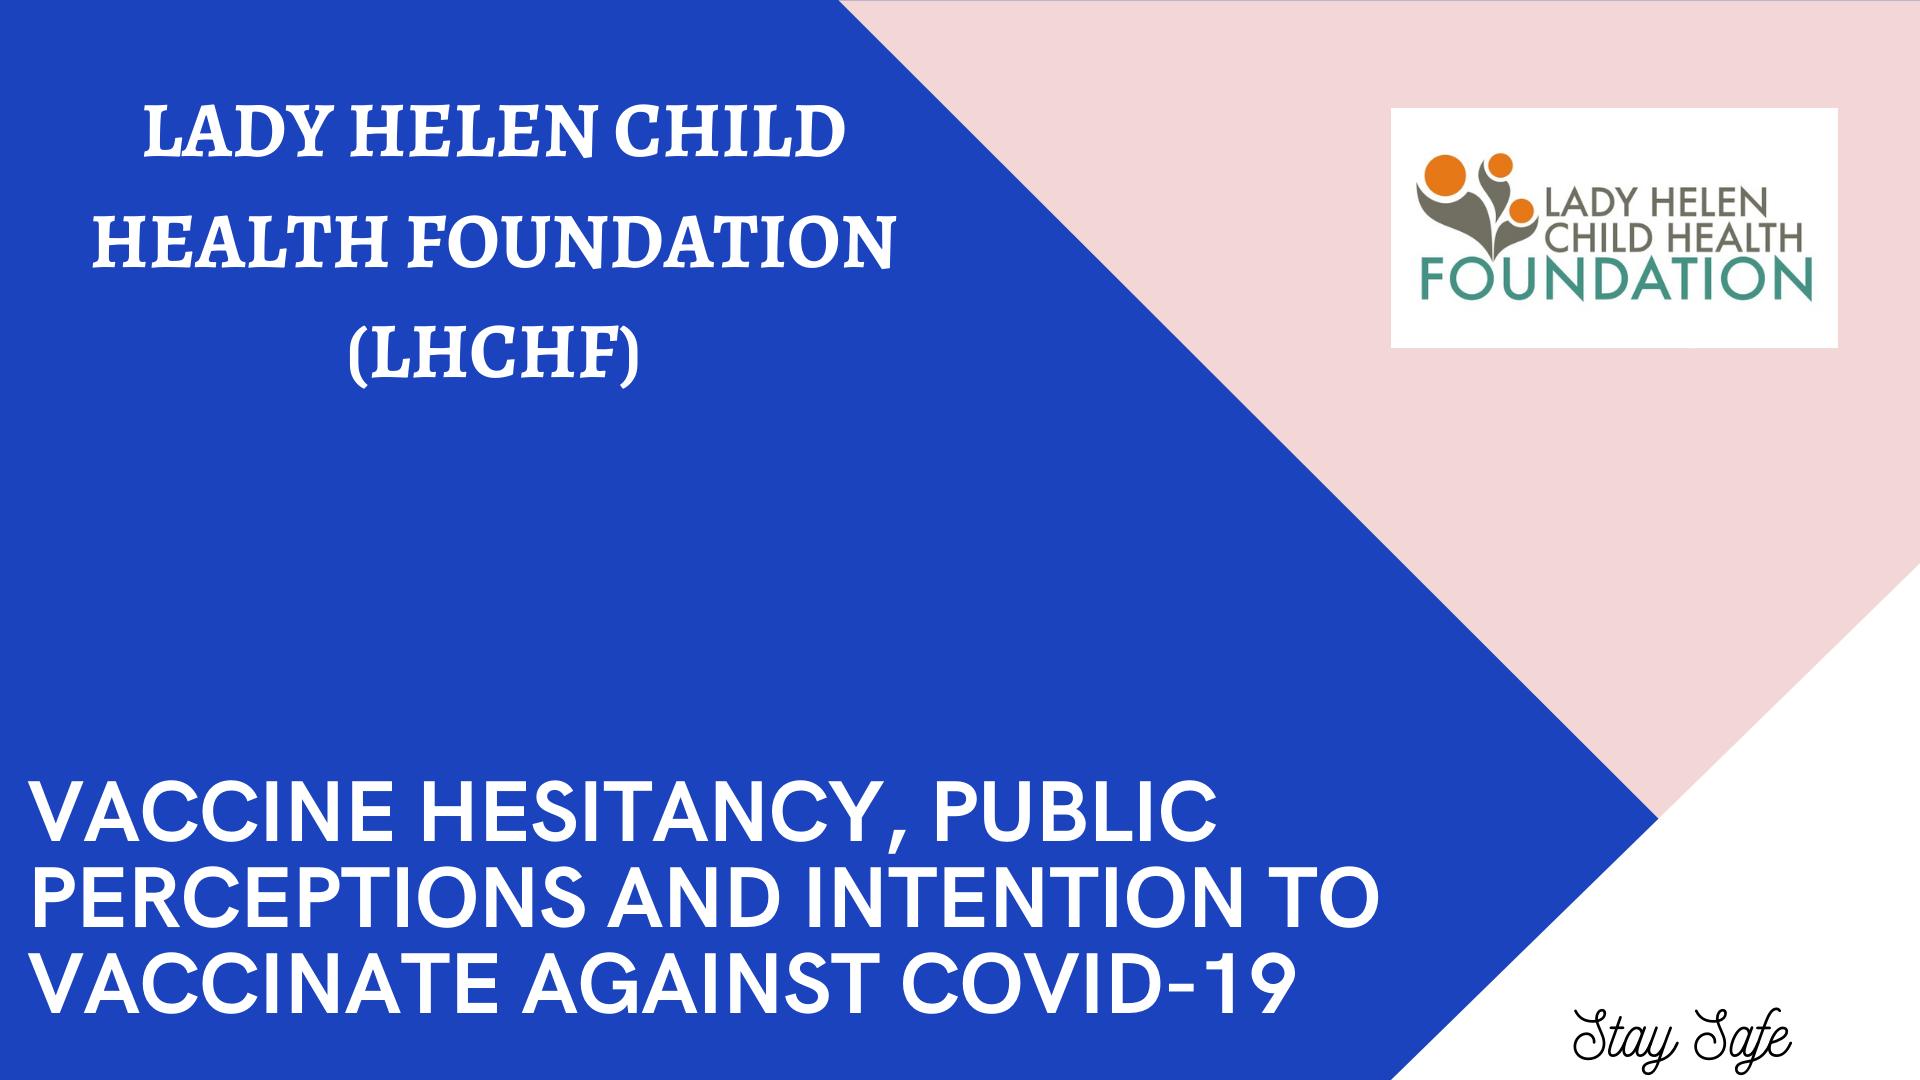 Lady Helen Child Health Foundation